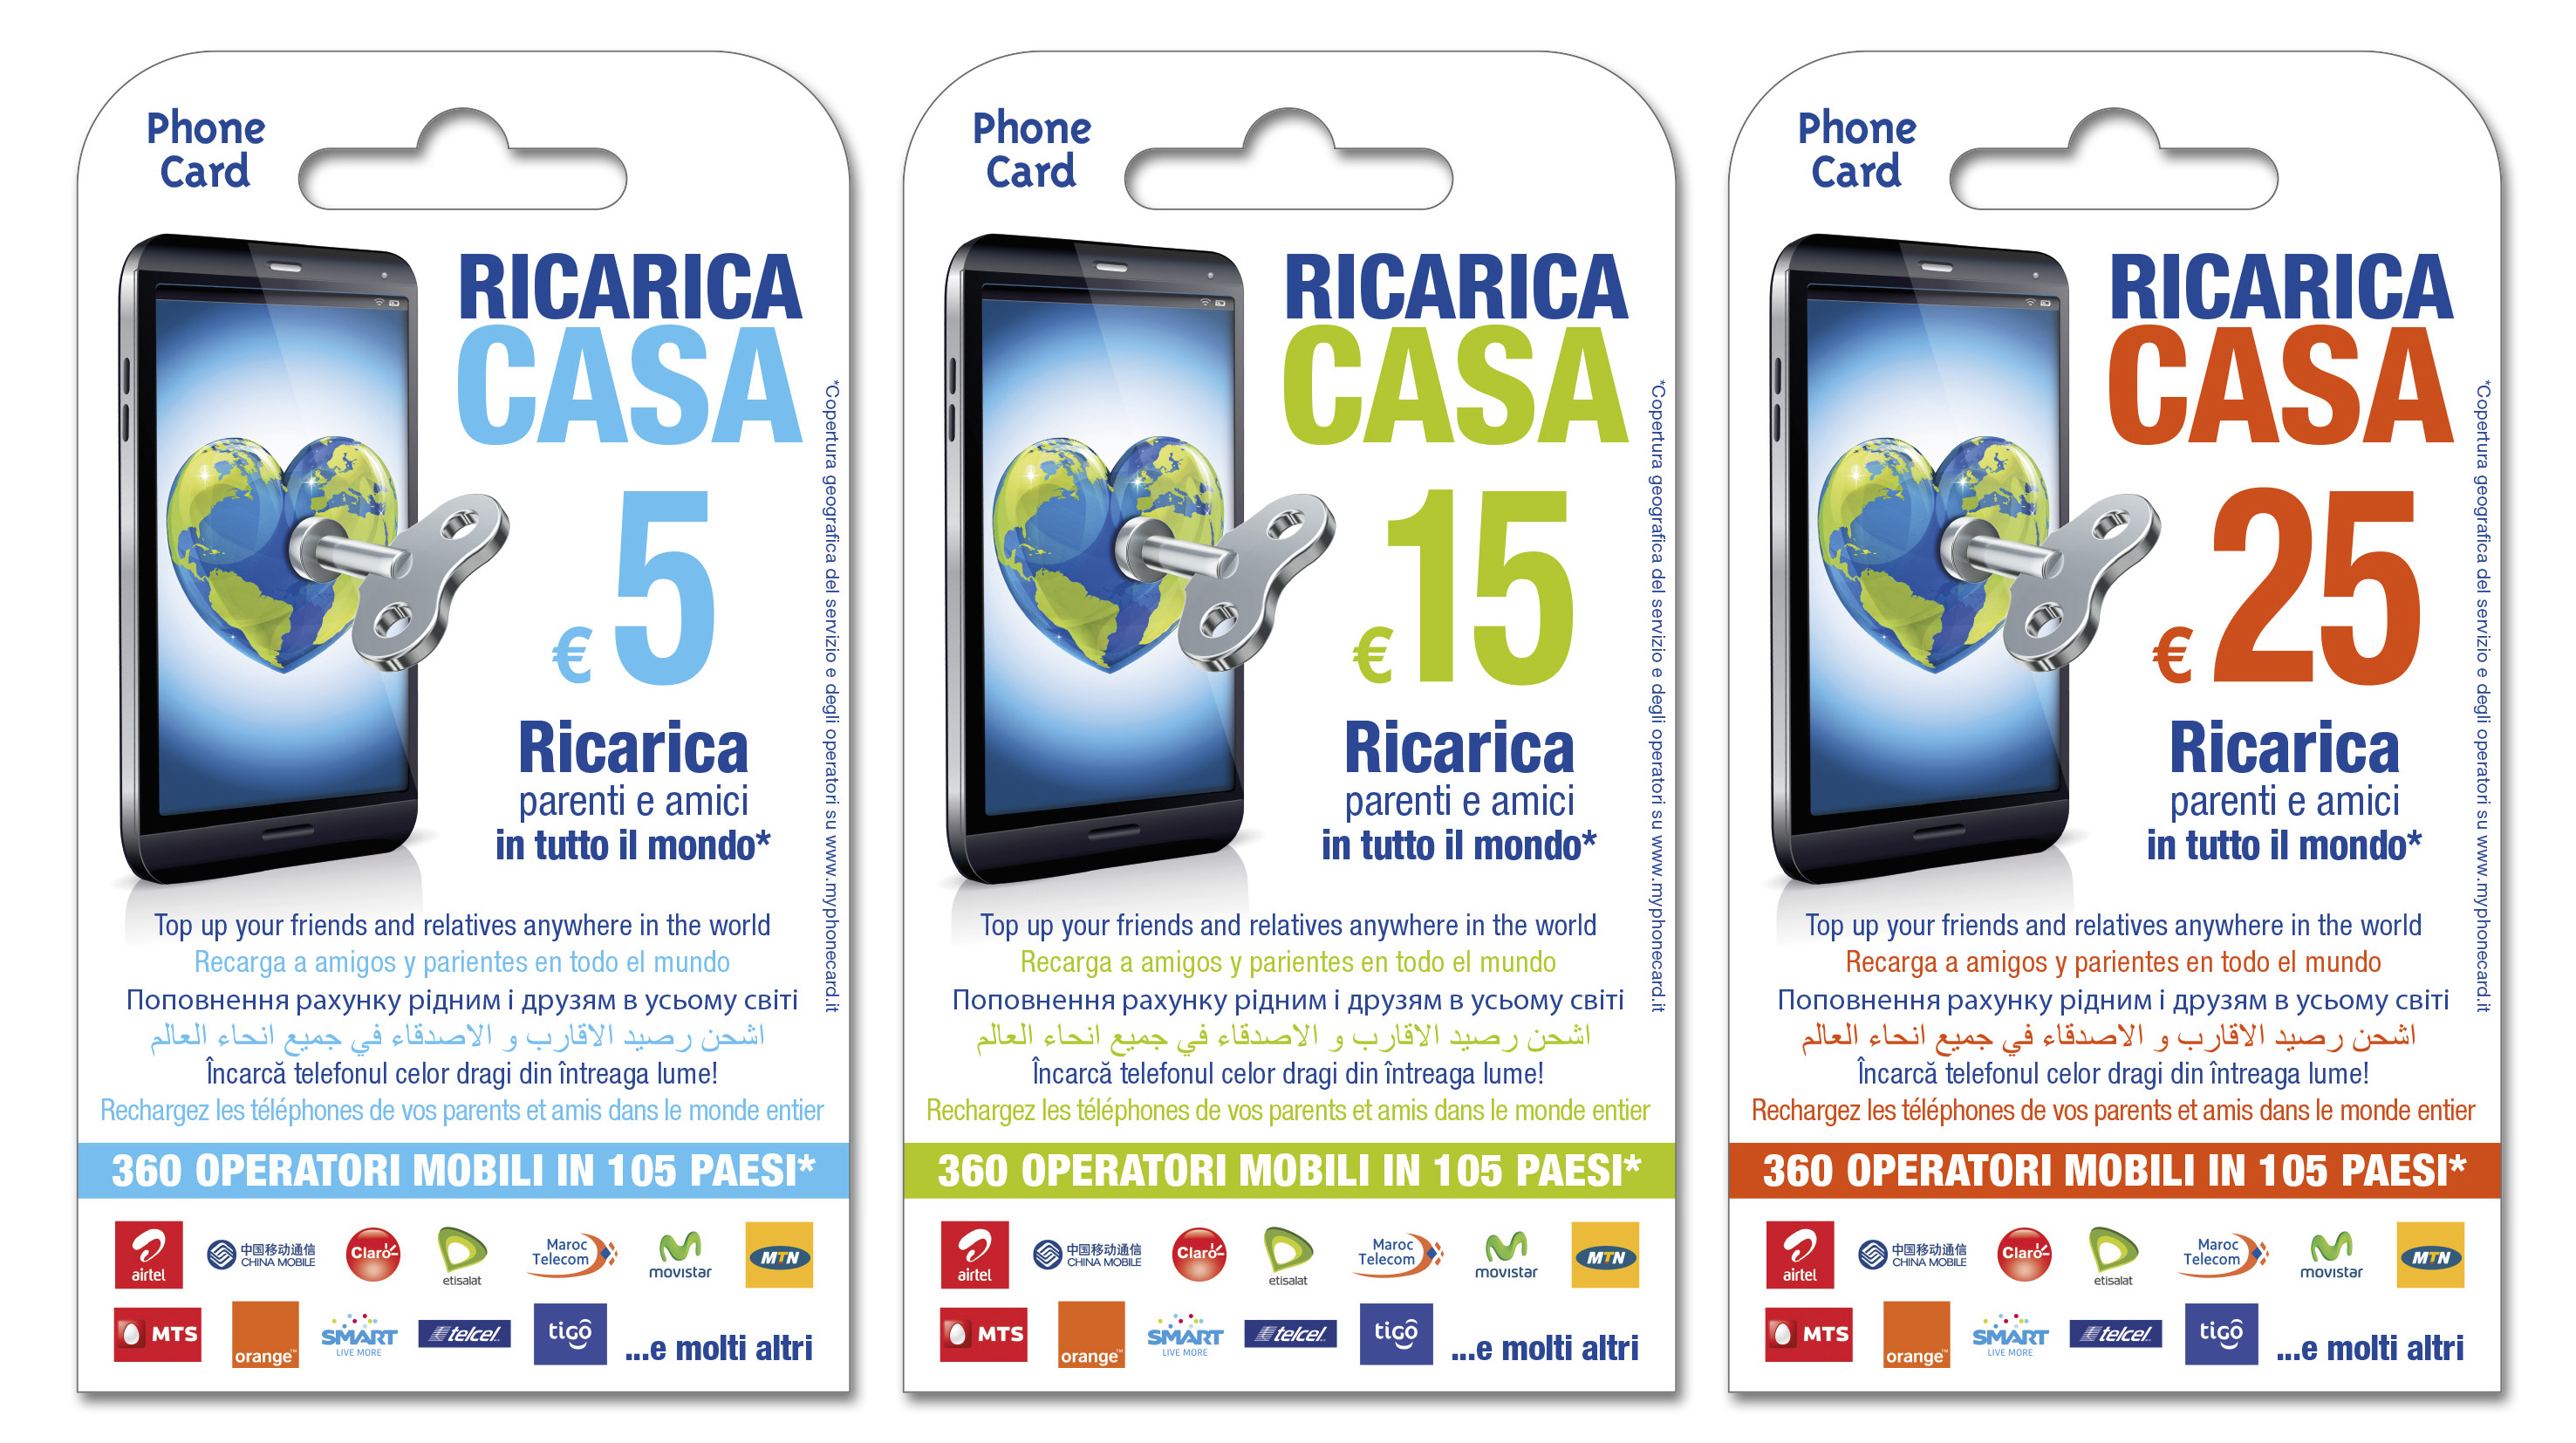 RicaricaCasa_5_fronte